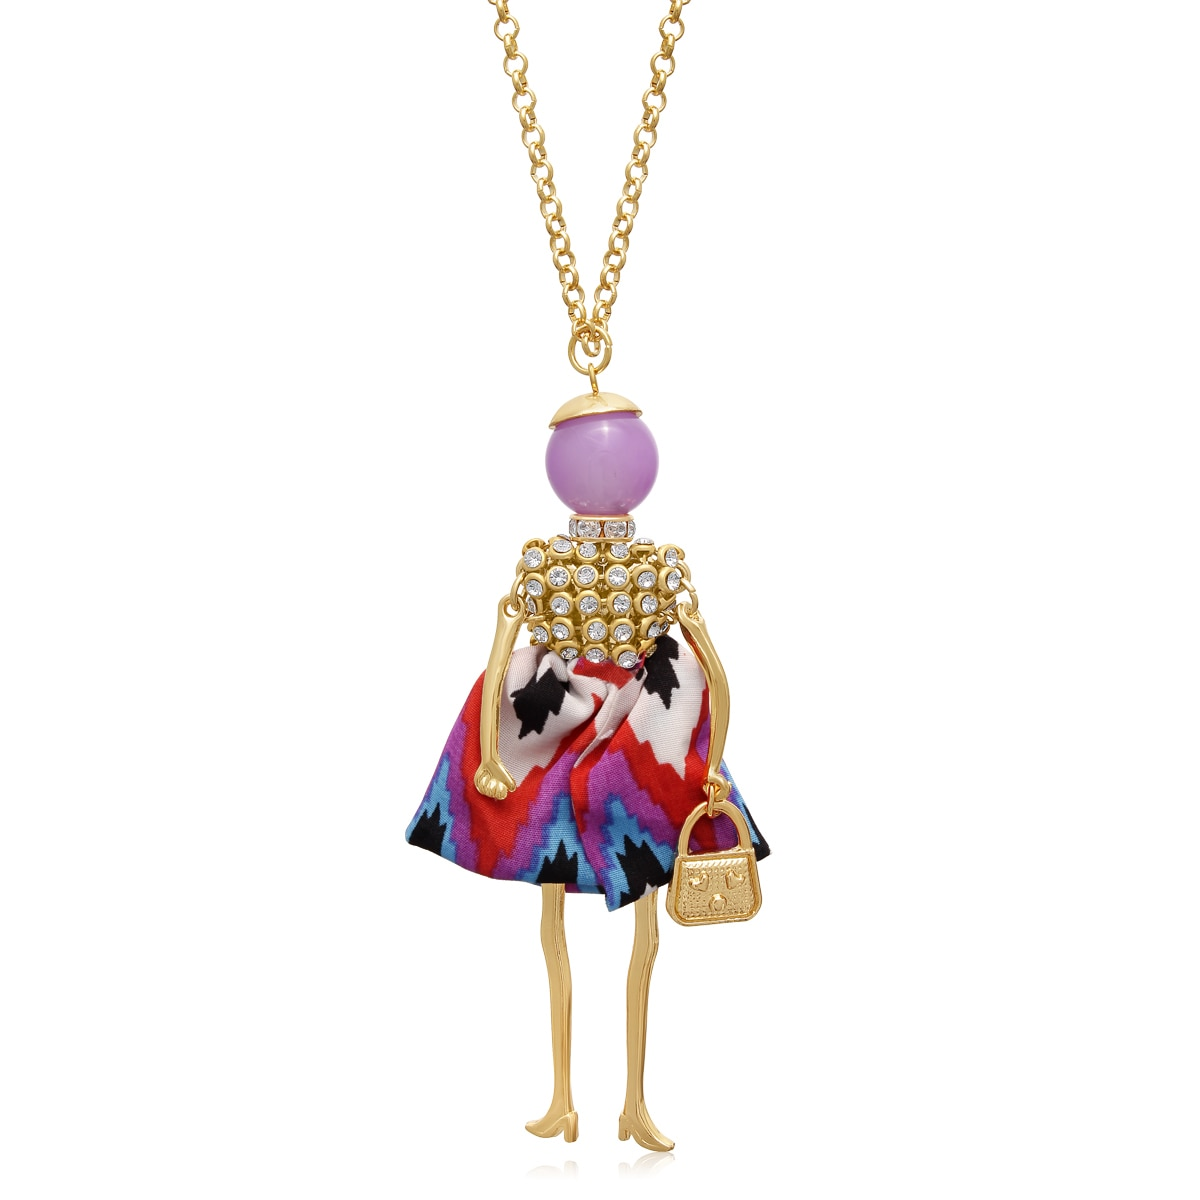 Adoriana Girls Just Wanna Have Fun Doll Necklace, 28 Inch...